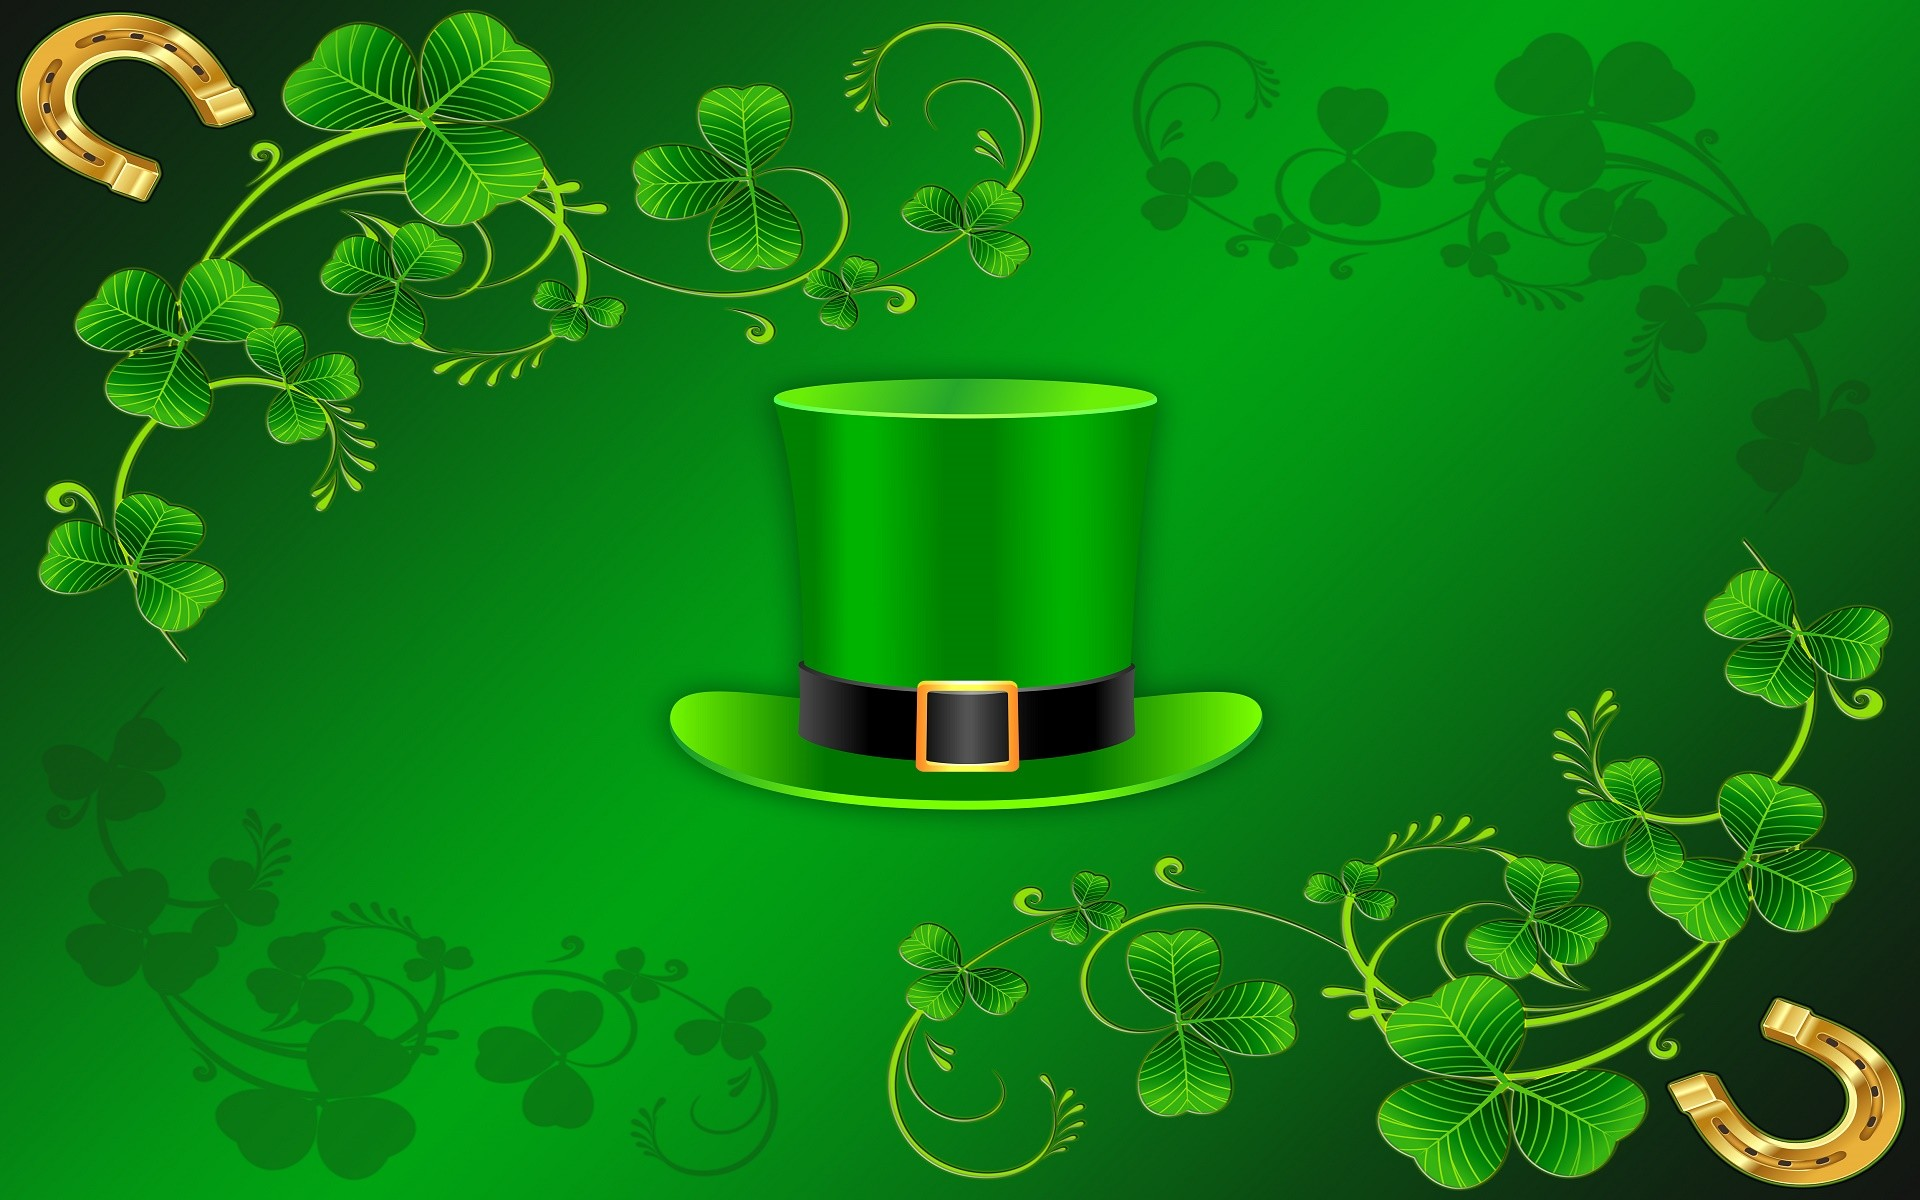 St Patrick Background Images: Saint Patrick Day Wallpaper (62+ Images